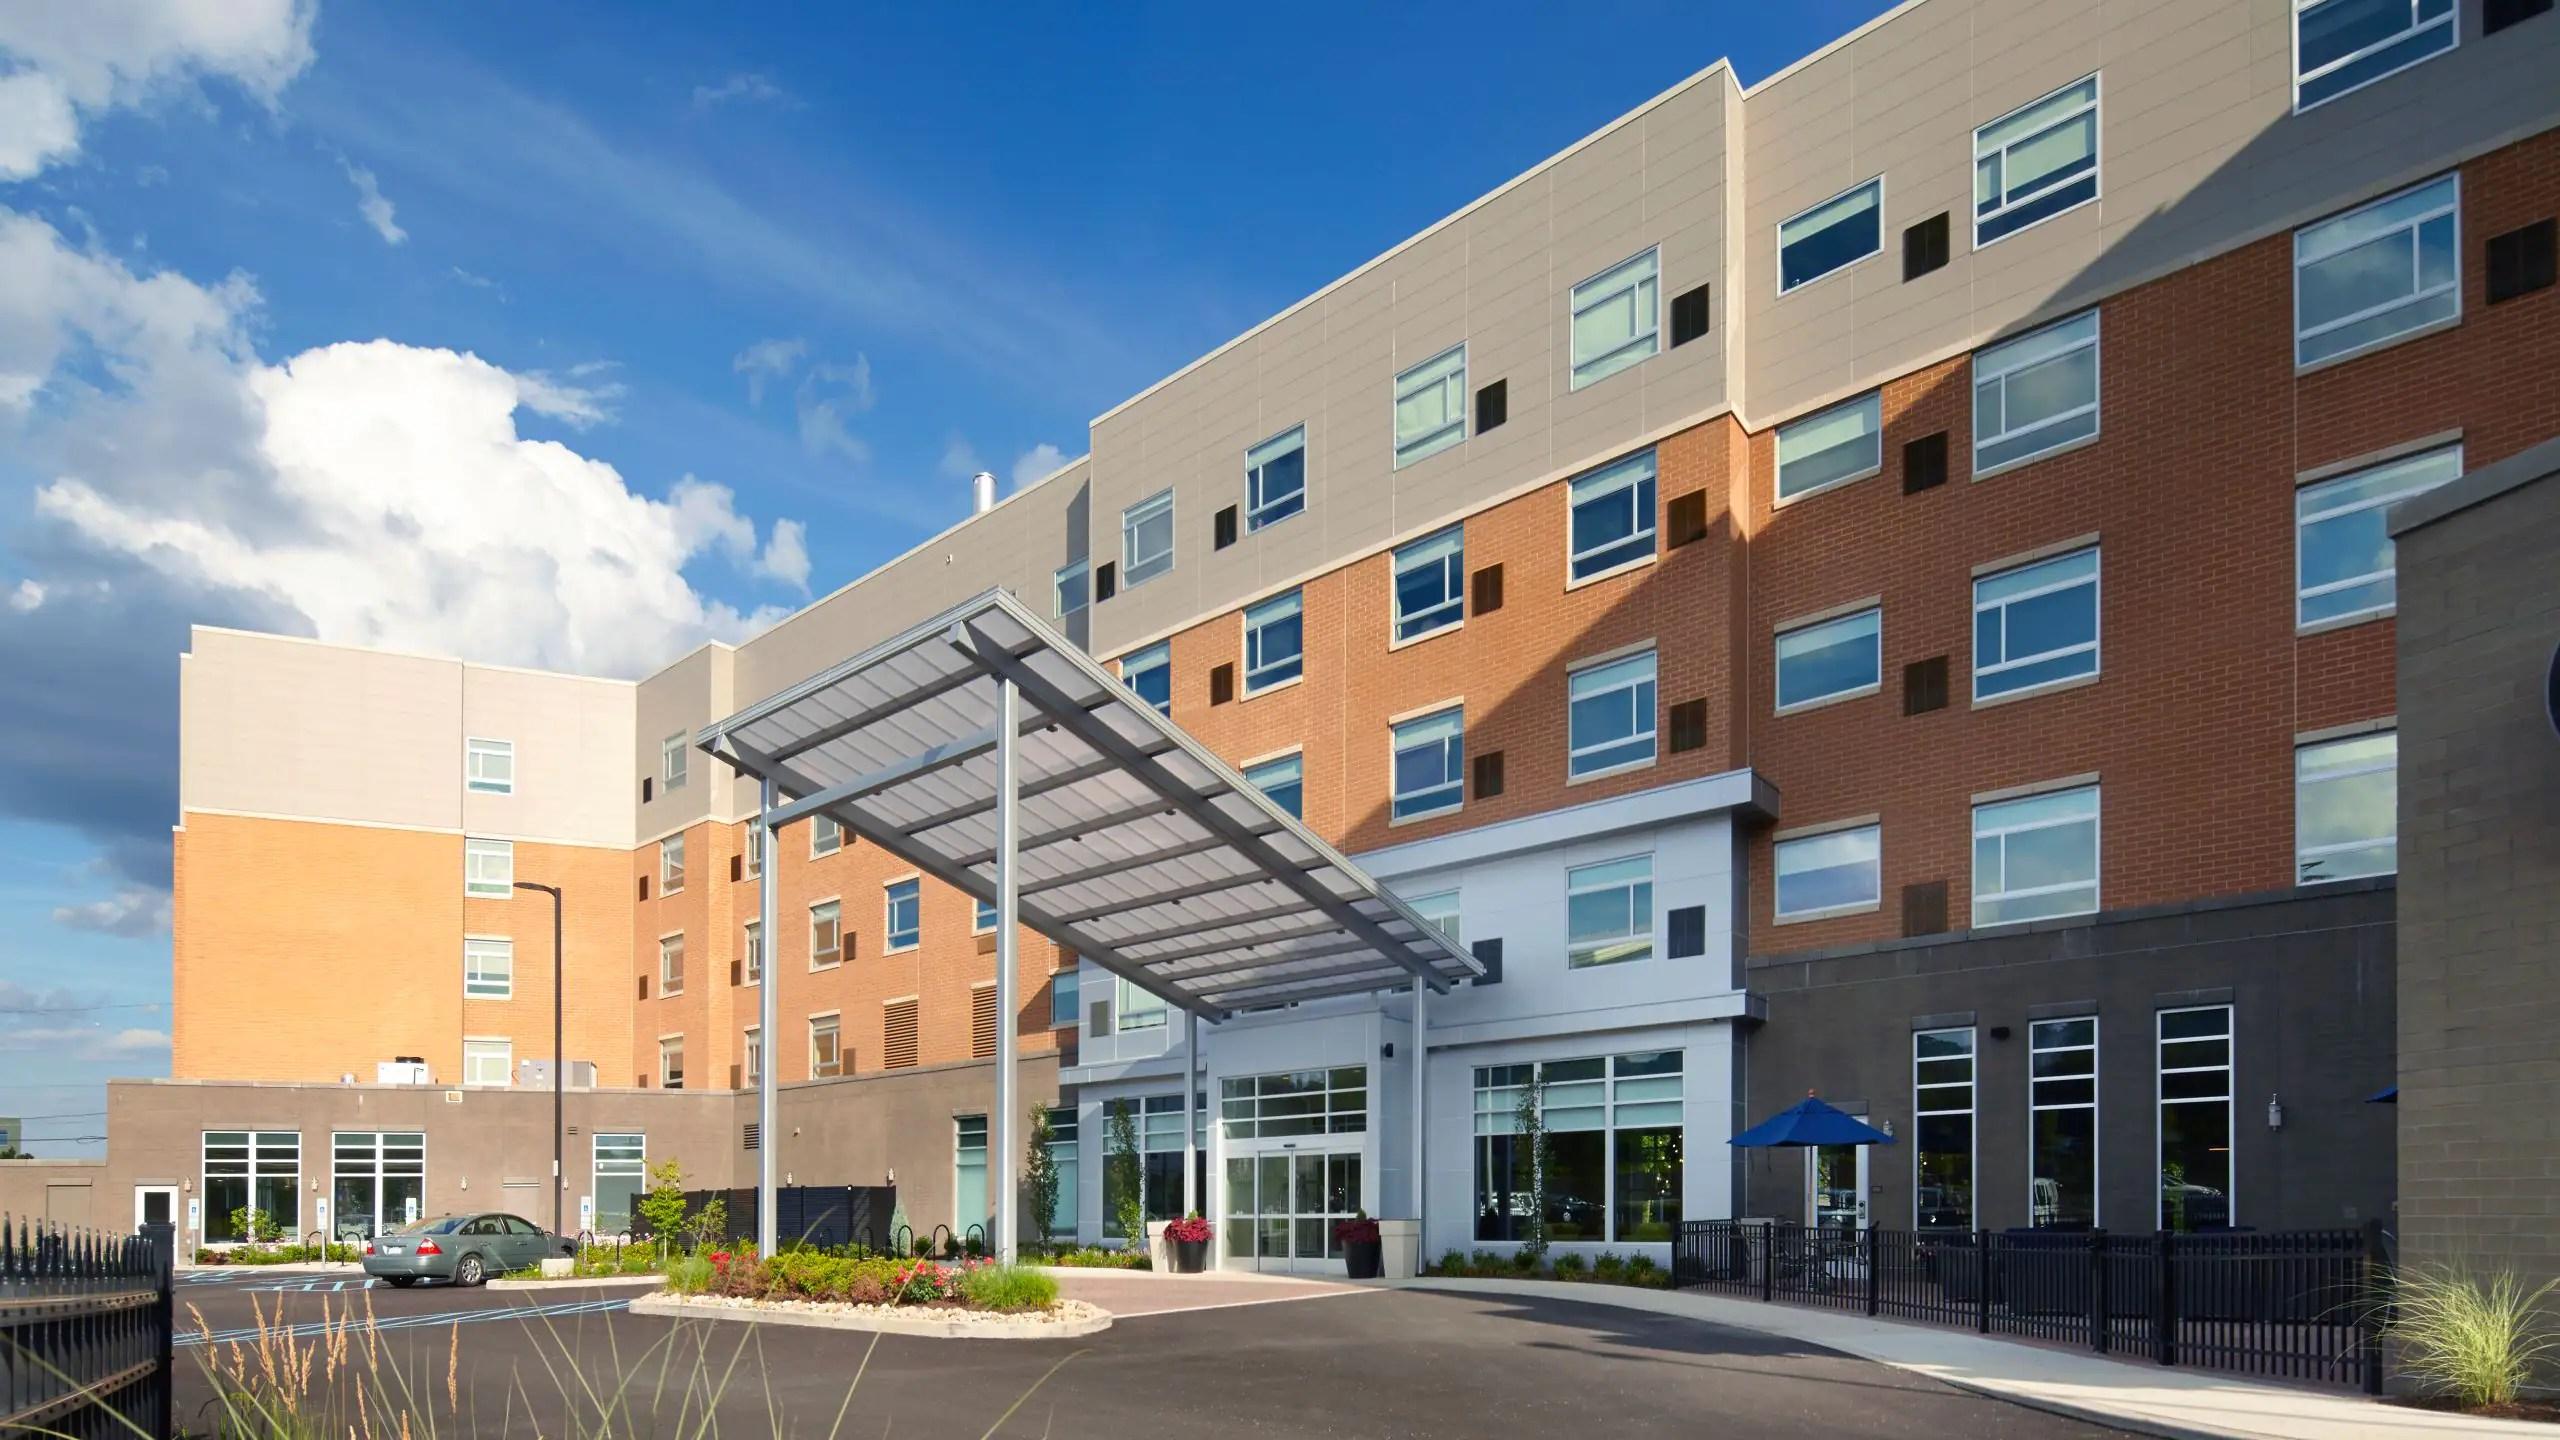 Hotels in Shadyside PA - Hyatt House Pittsburgh/Bloomfield/Shadyside